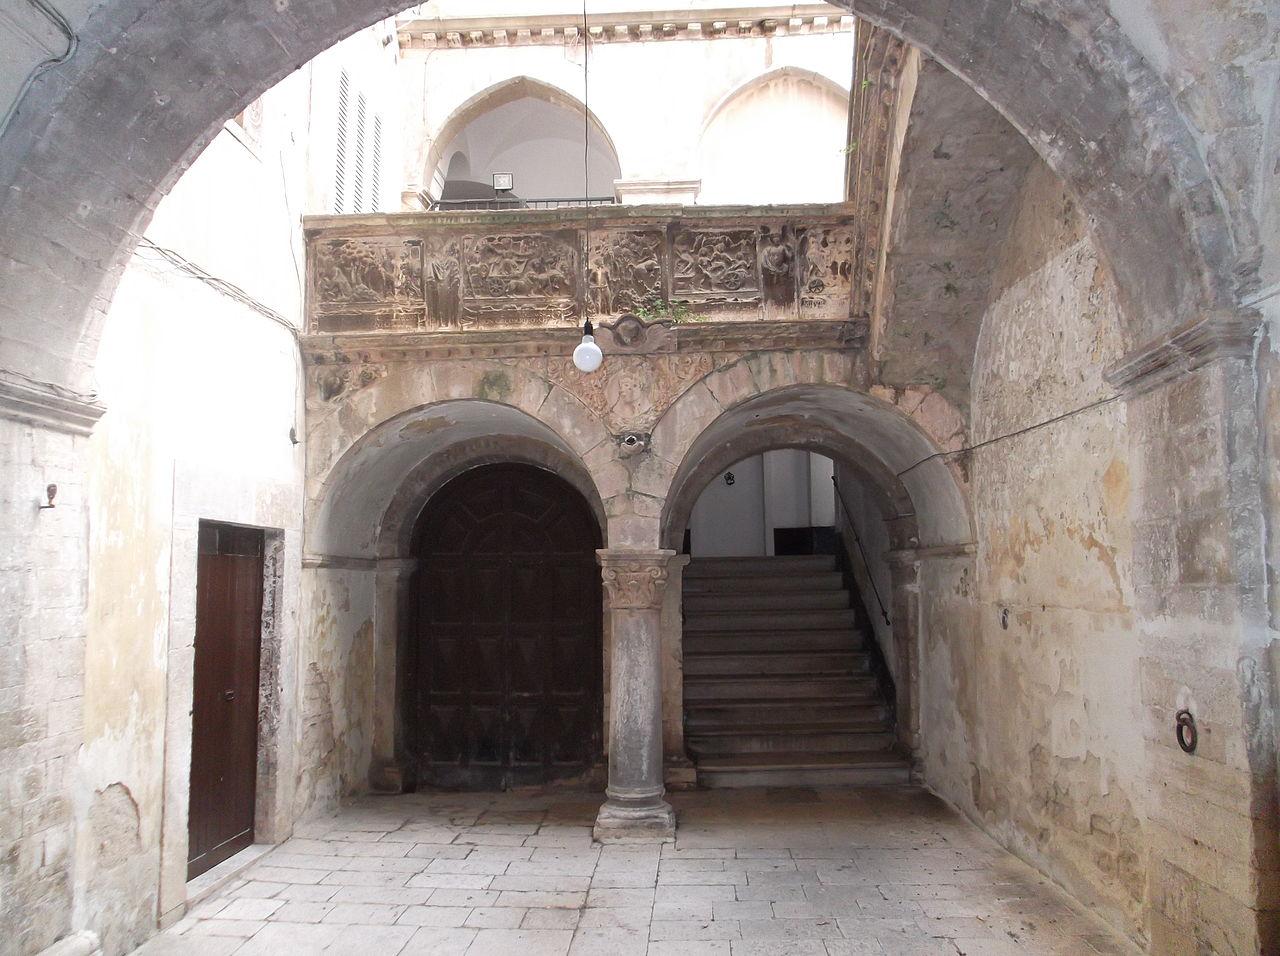 Palazzo spada interno ruvo.JPG